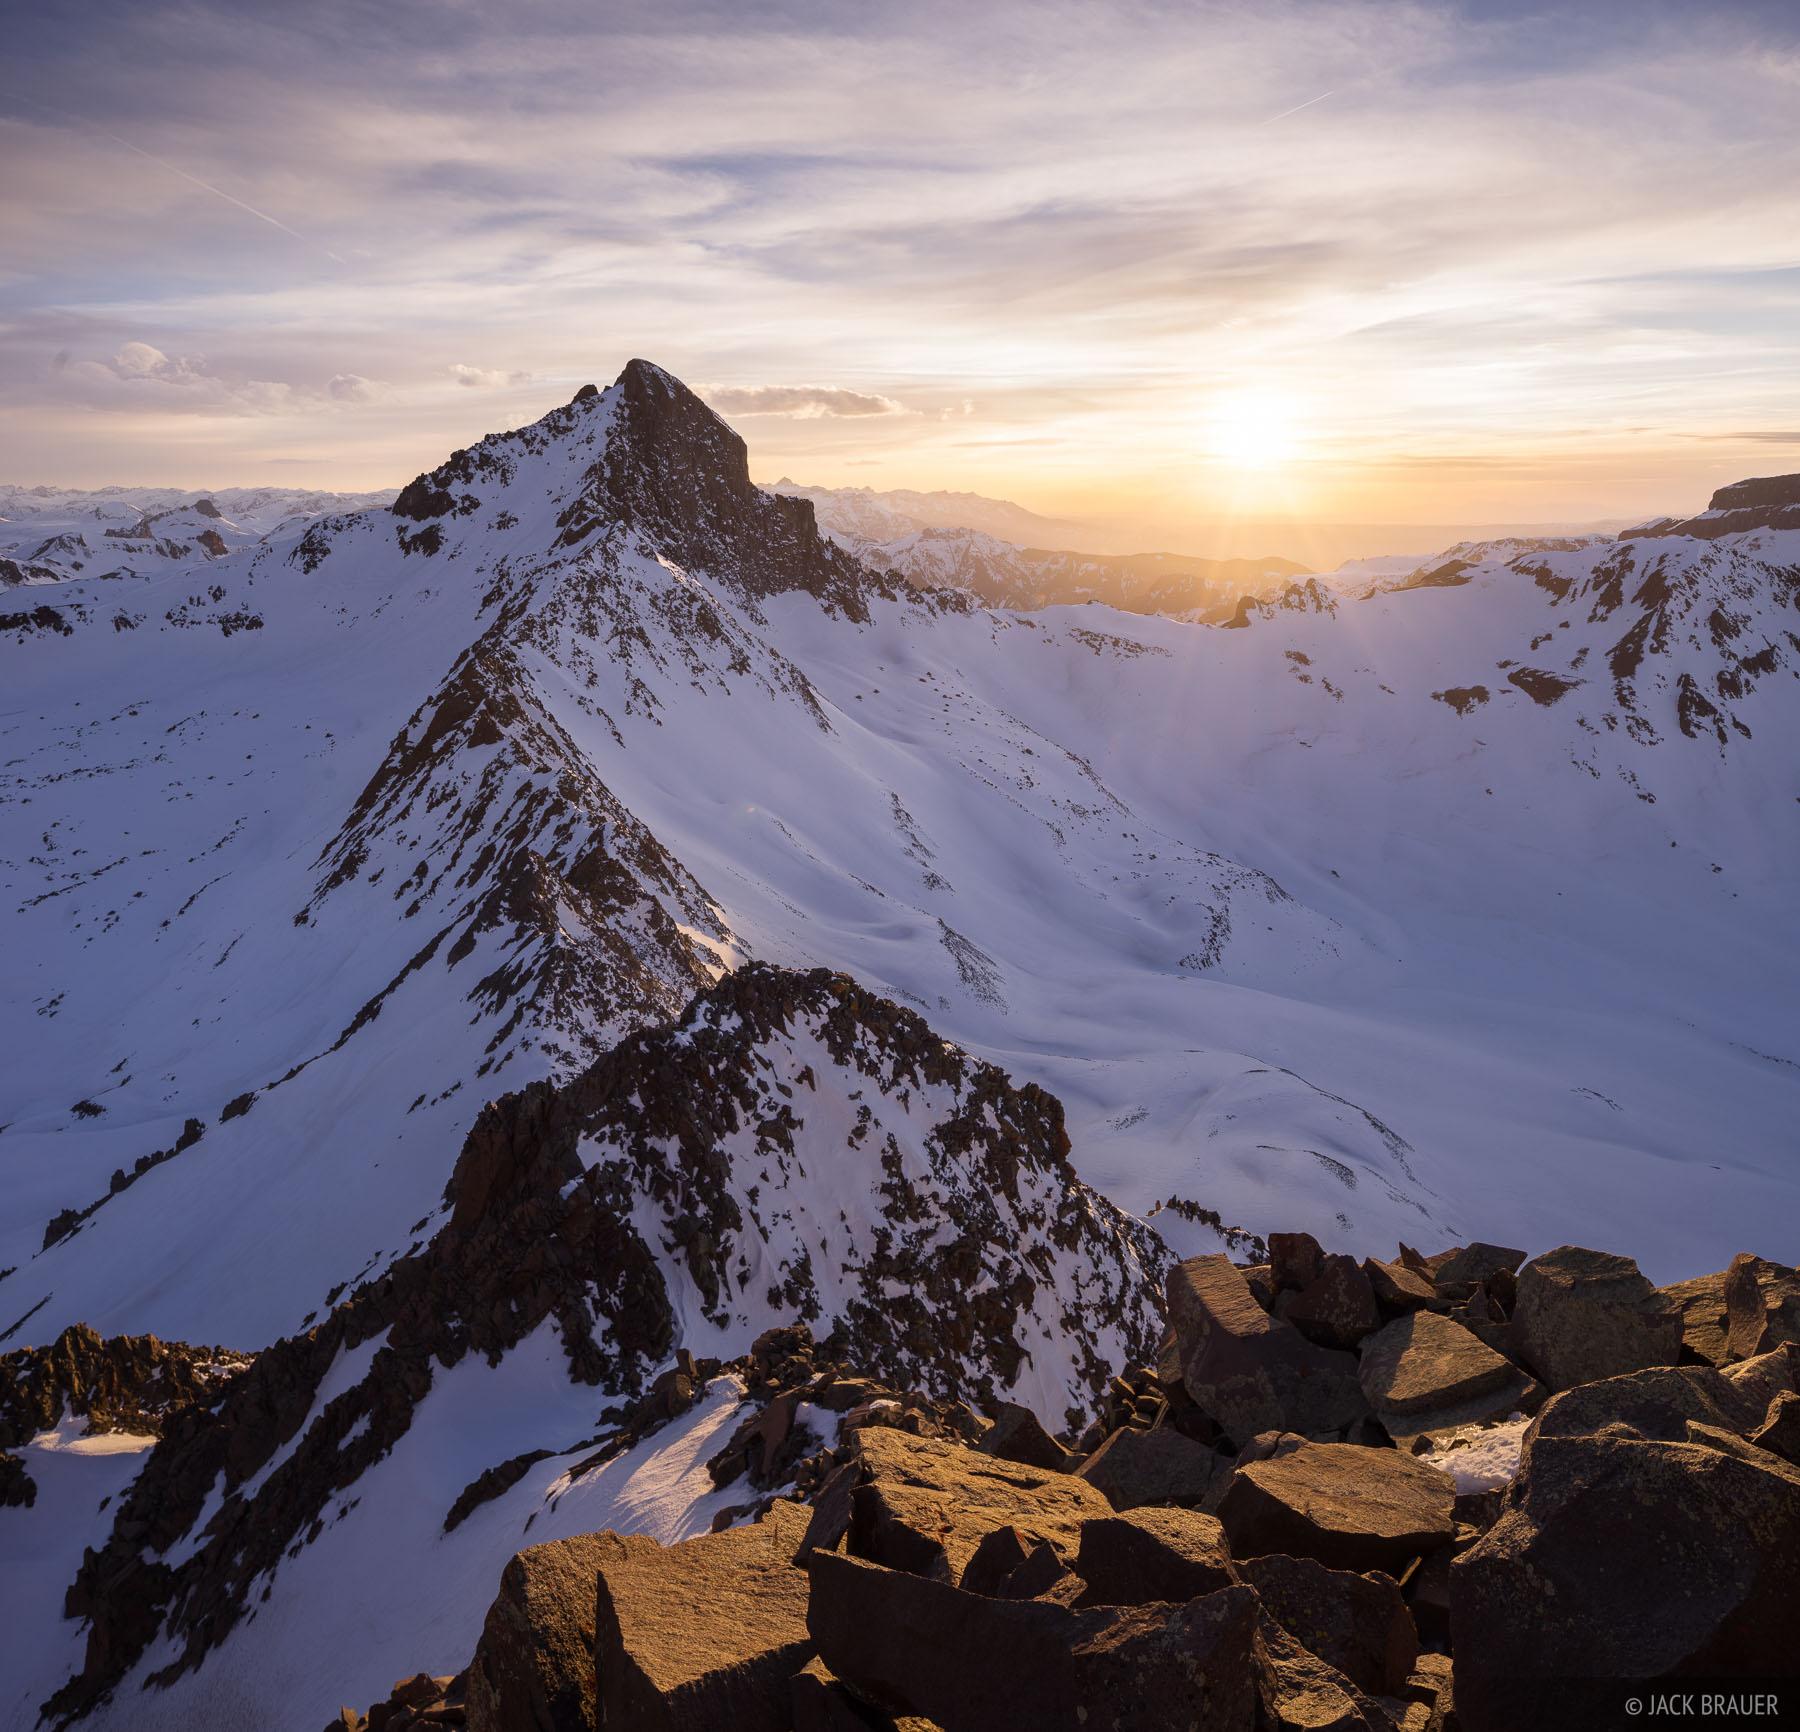 Colorado,San Juan Mountains,Uncompahgre Wilderness,Wetterhorn Peak, sunset, photo